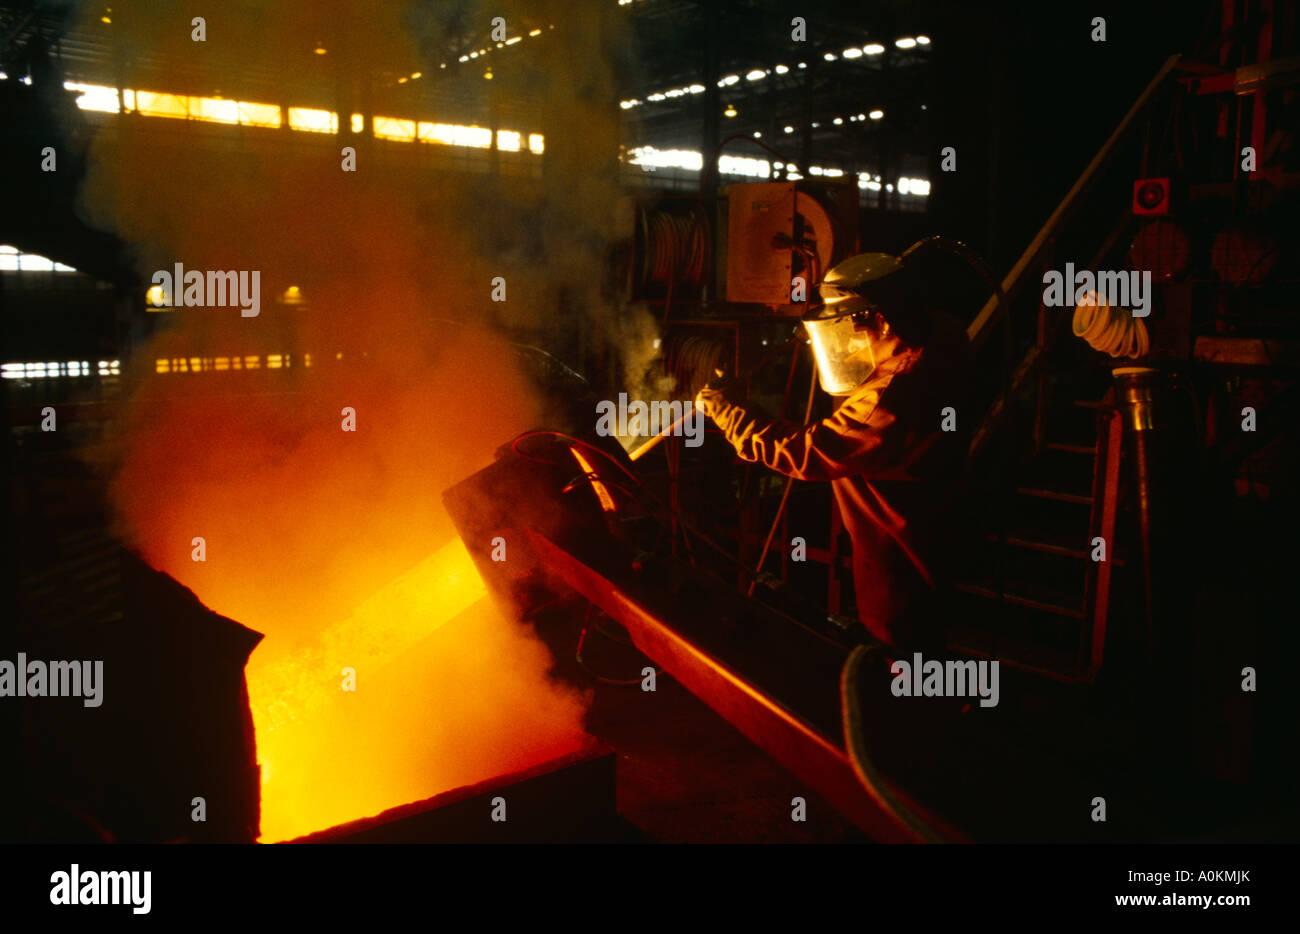 making steel in Tata Corus Llanwern steel works in Wales Stock Photo